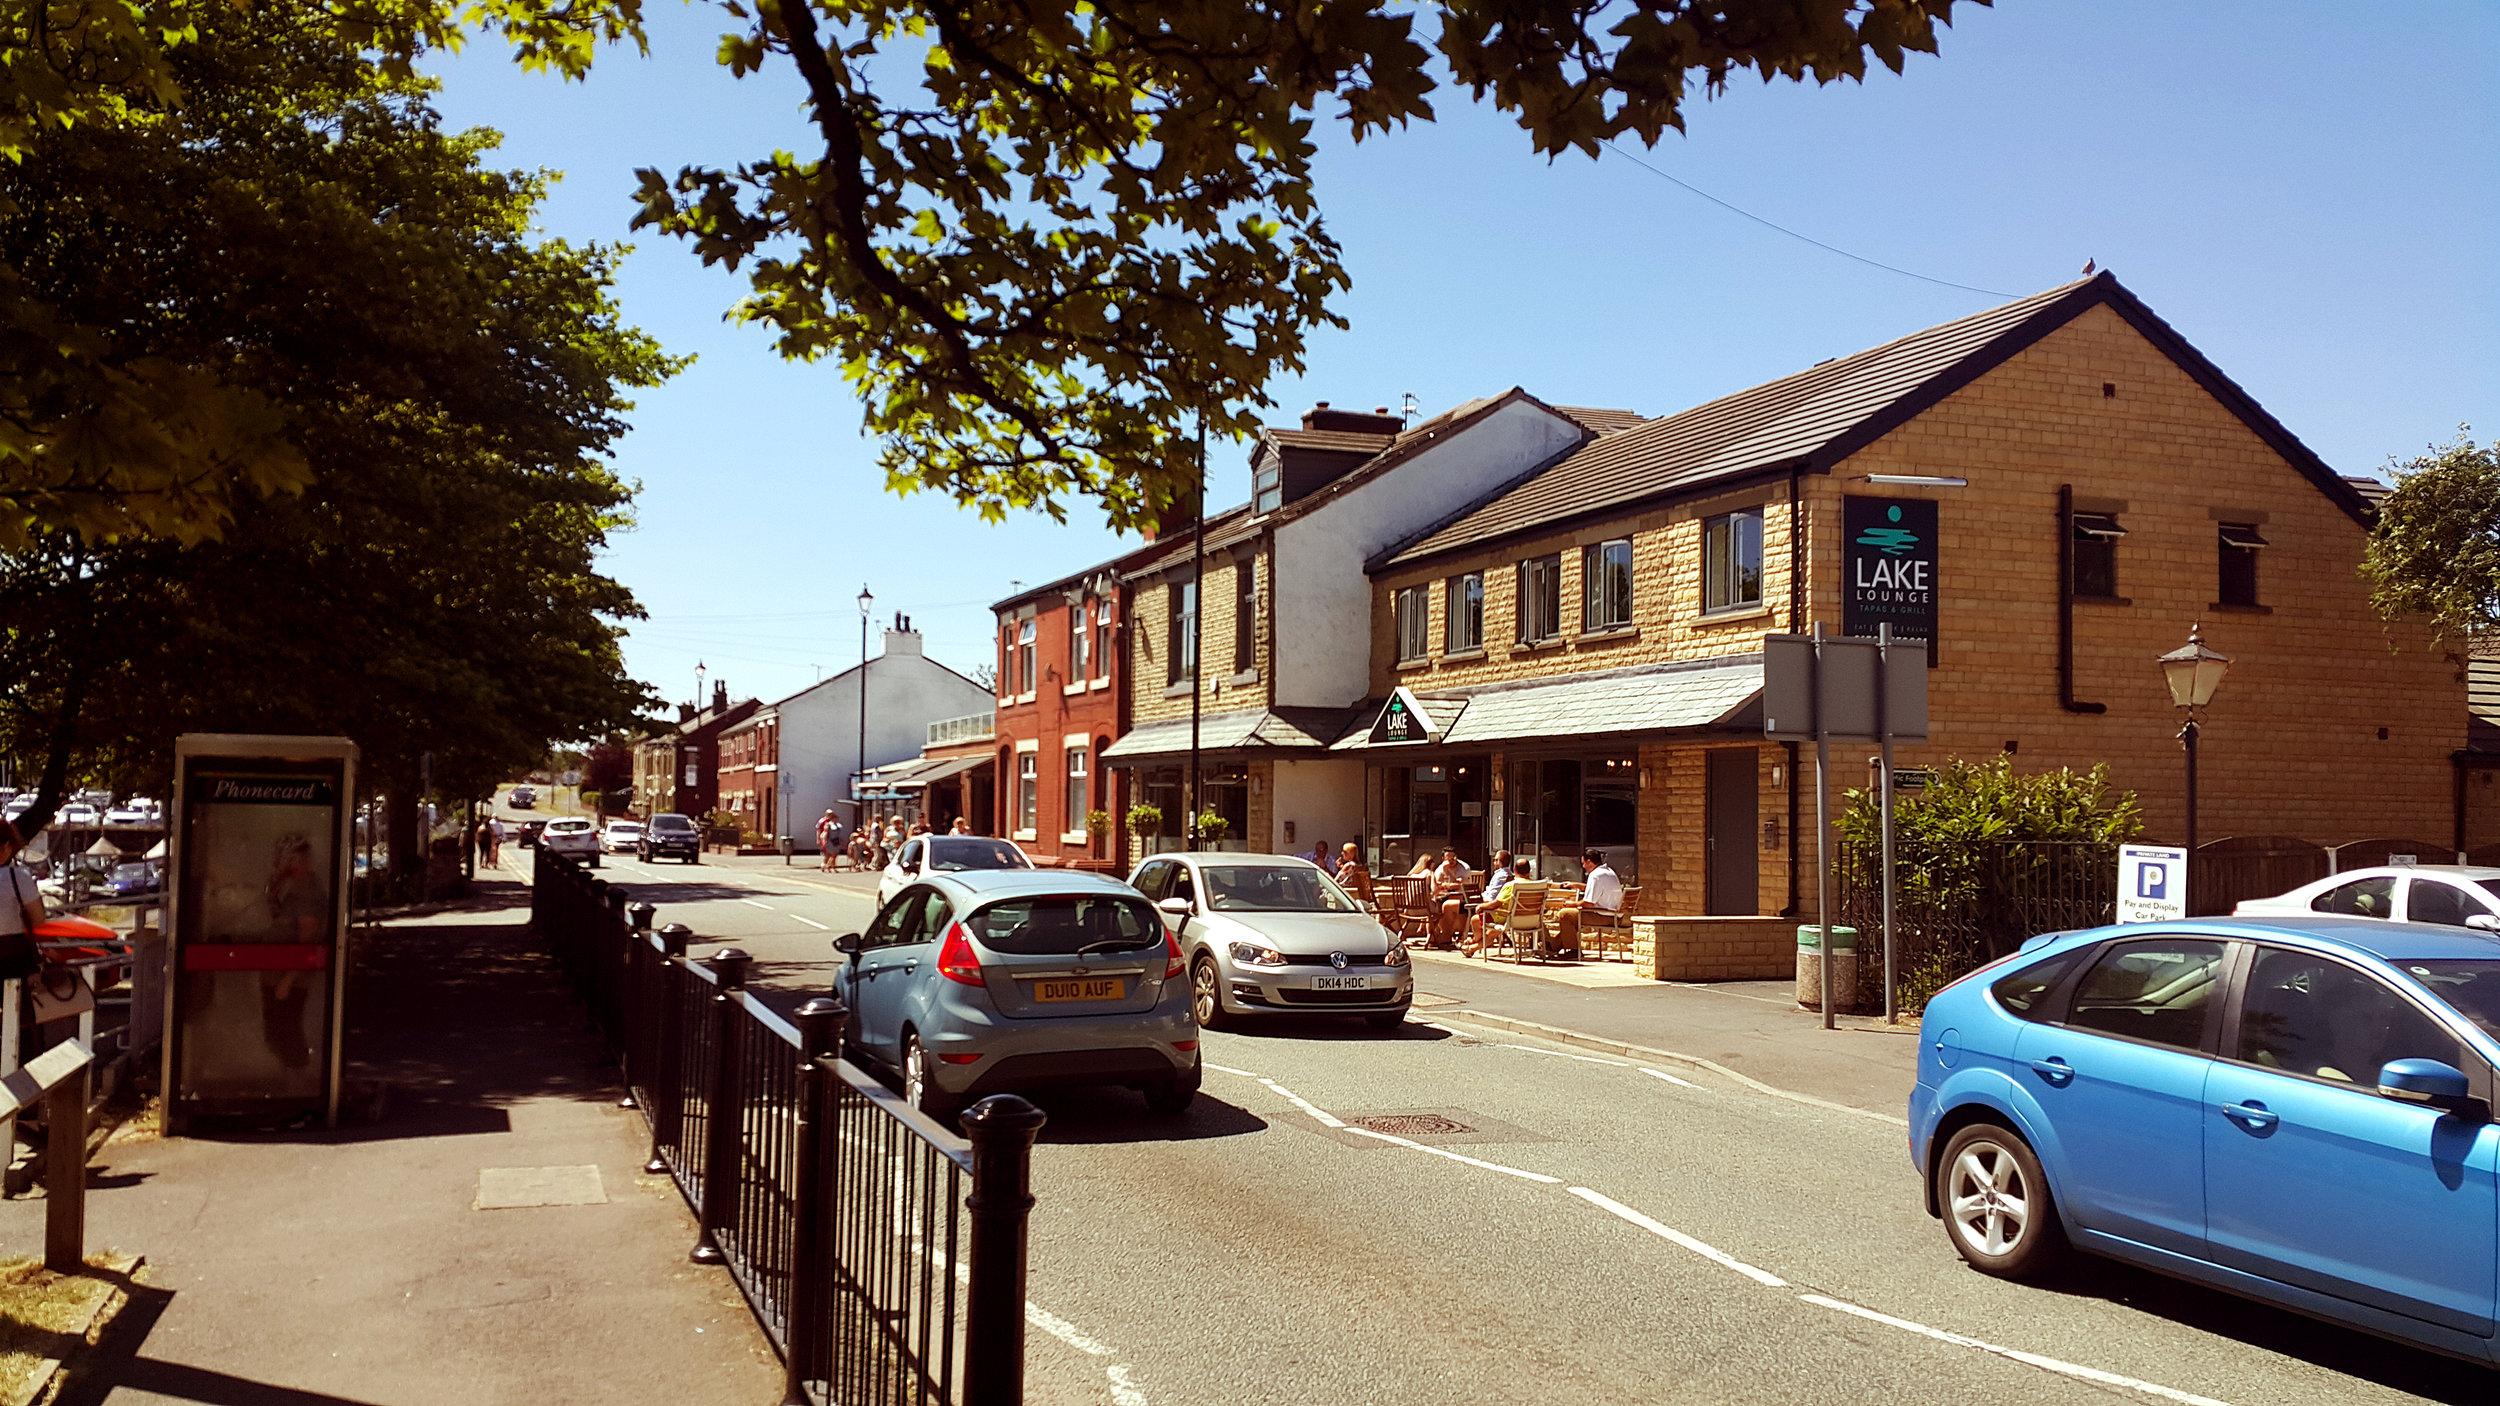 A street view in Littleborough, Rochdale